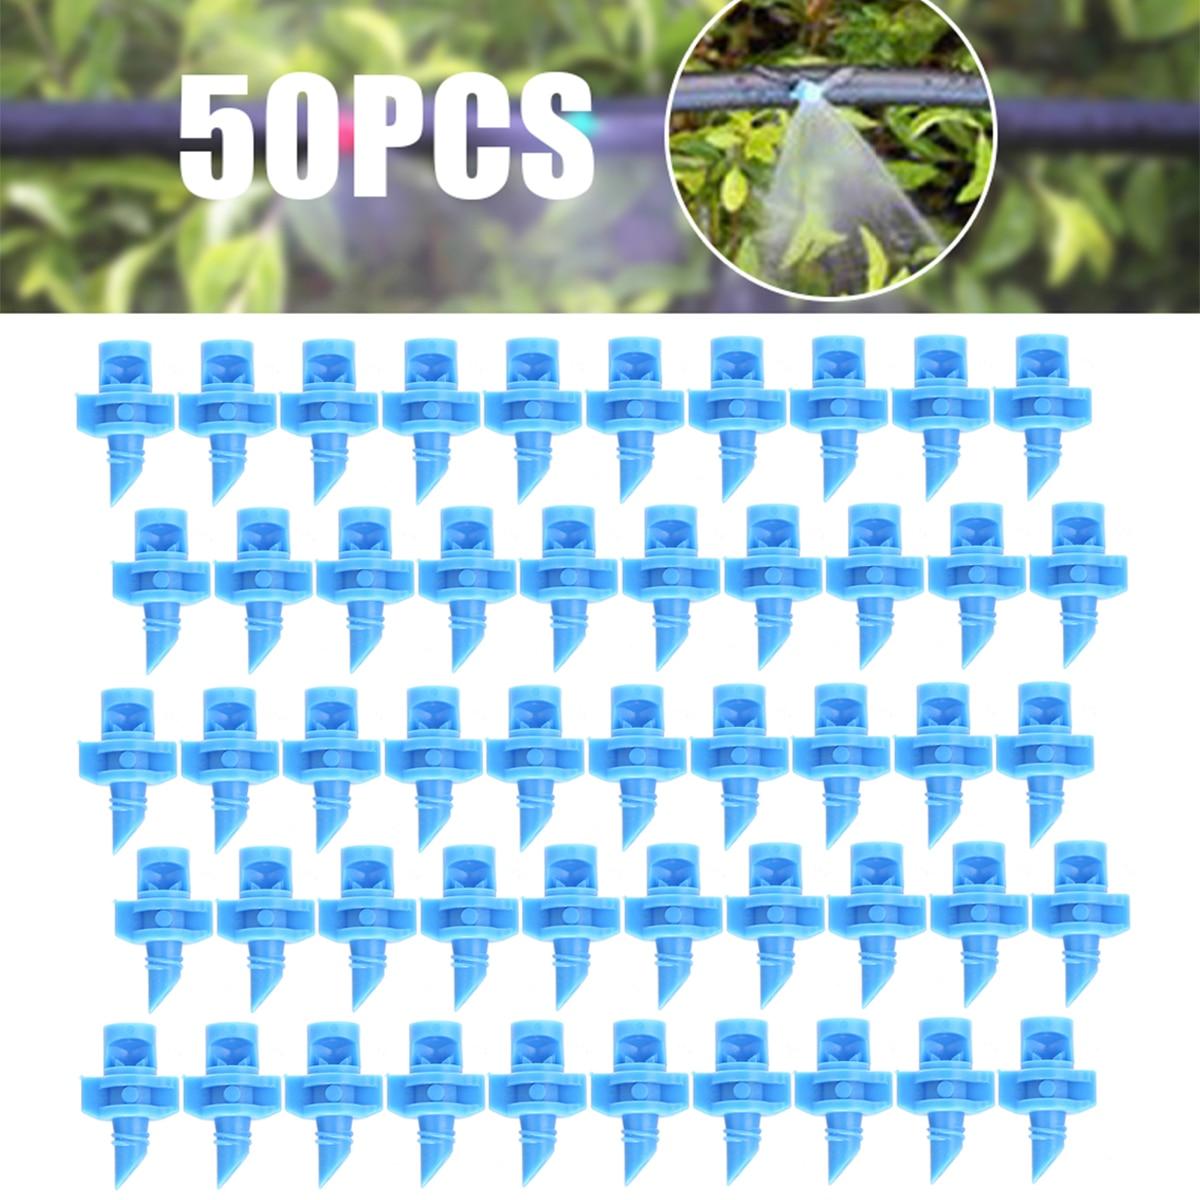 50PCS/pack 90 Degree Refraction Misting Nozzle Garden Irrigation Sprinkler For Plant Spray Nozzle Mist Sprayer Irrigation